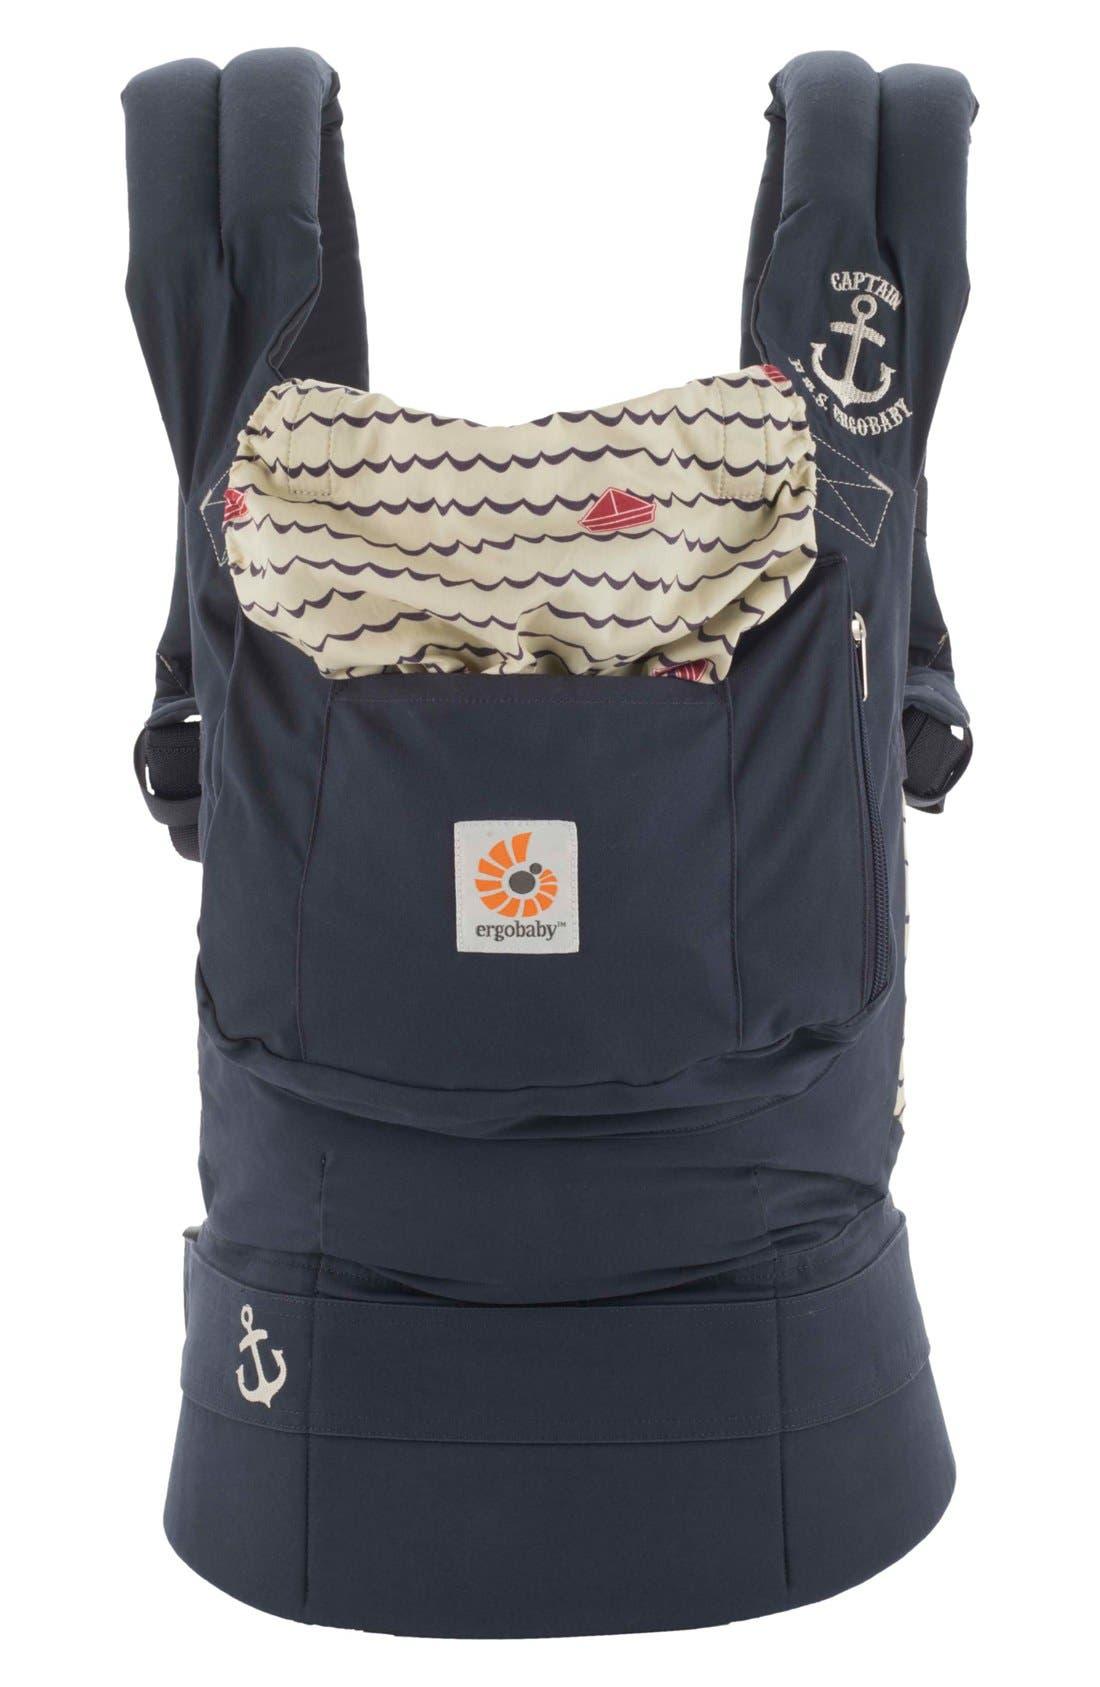 Main Image - ERGObaby 'Original' Cotton Baby Carrier (Baby)